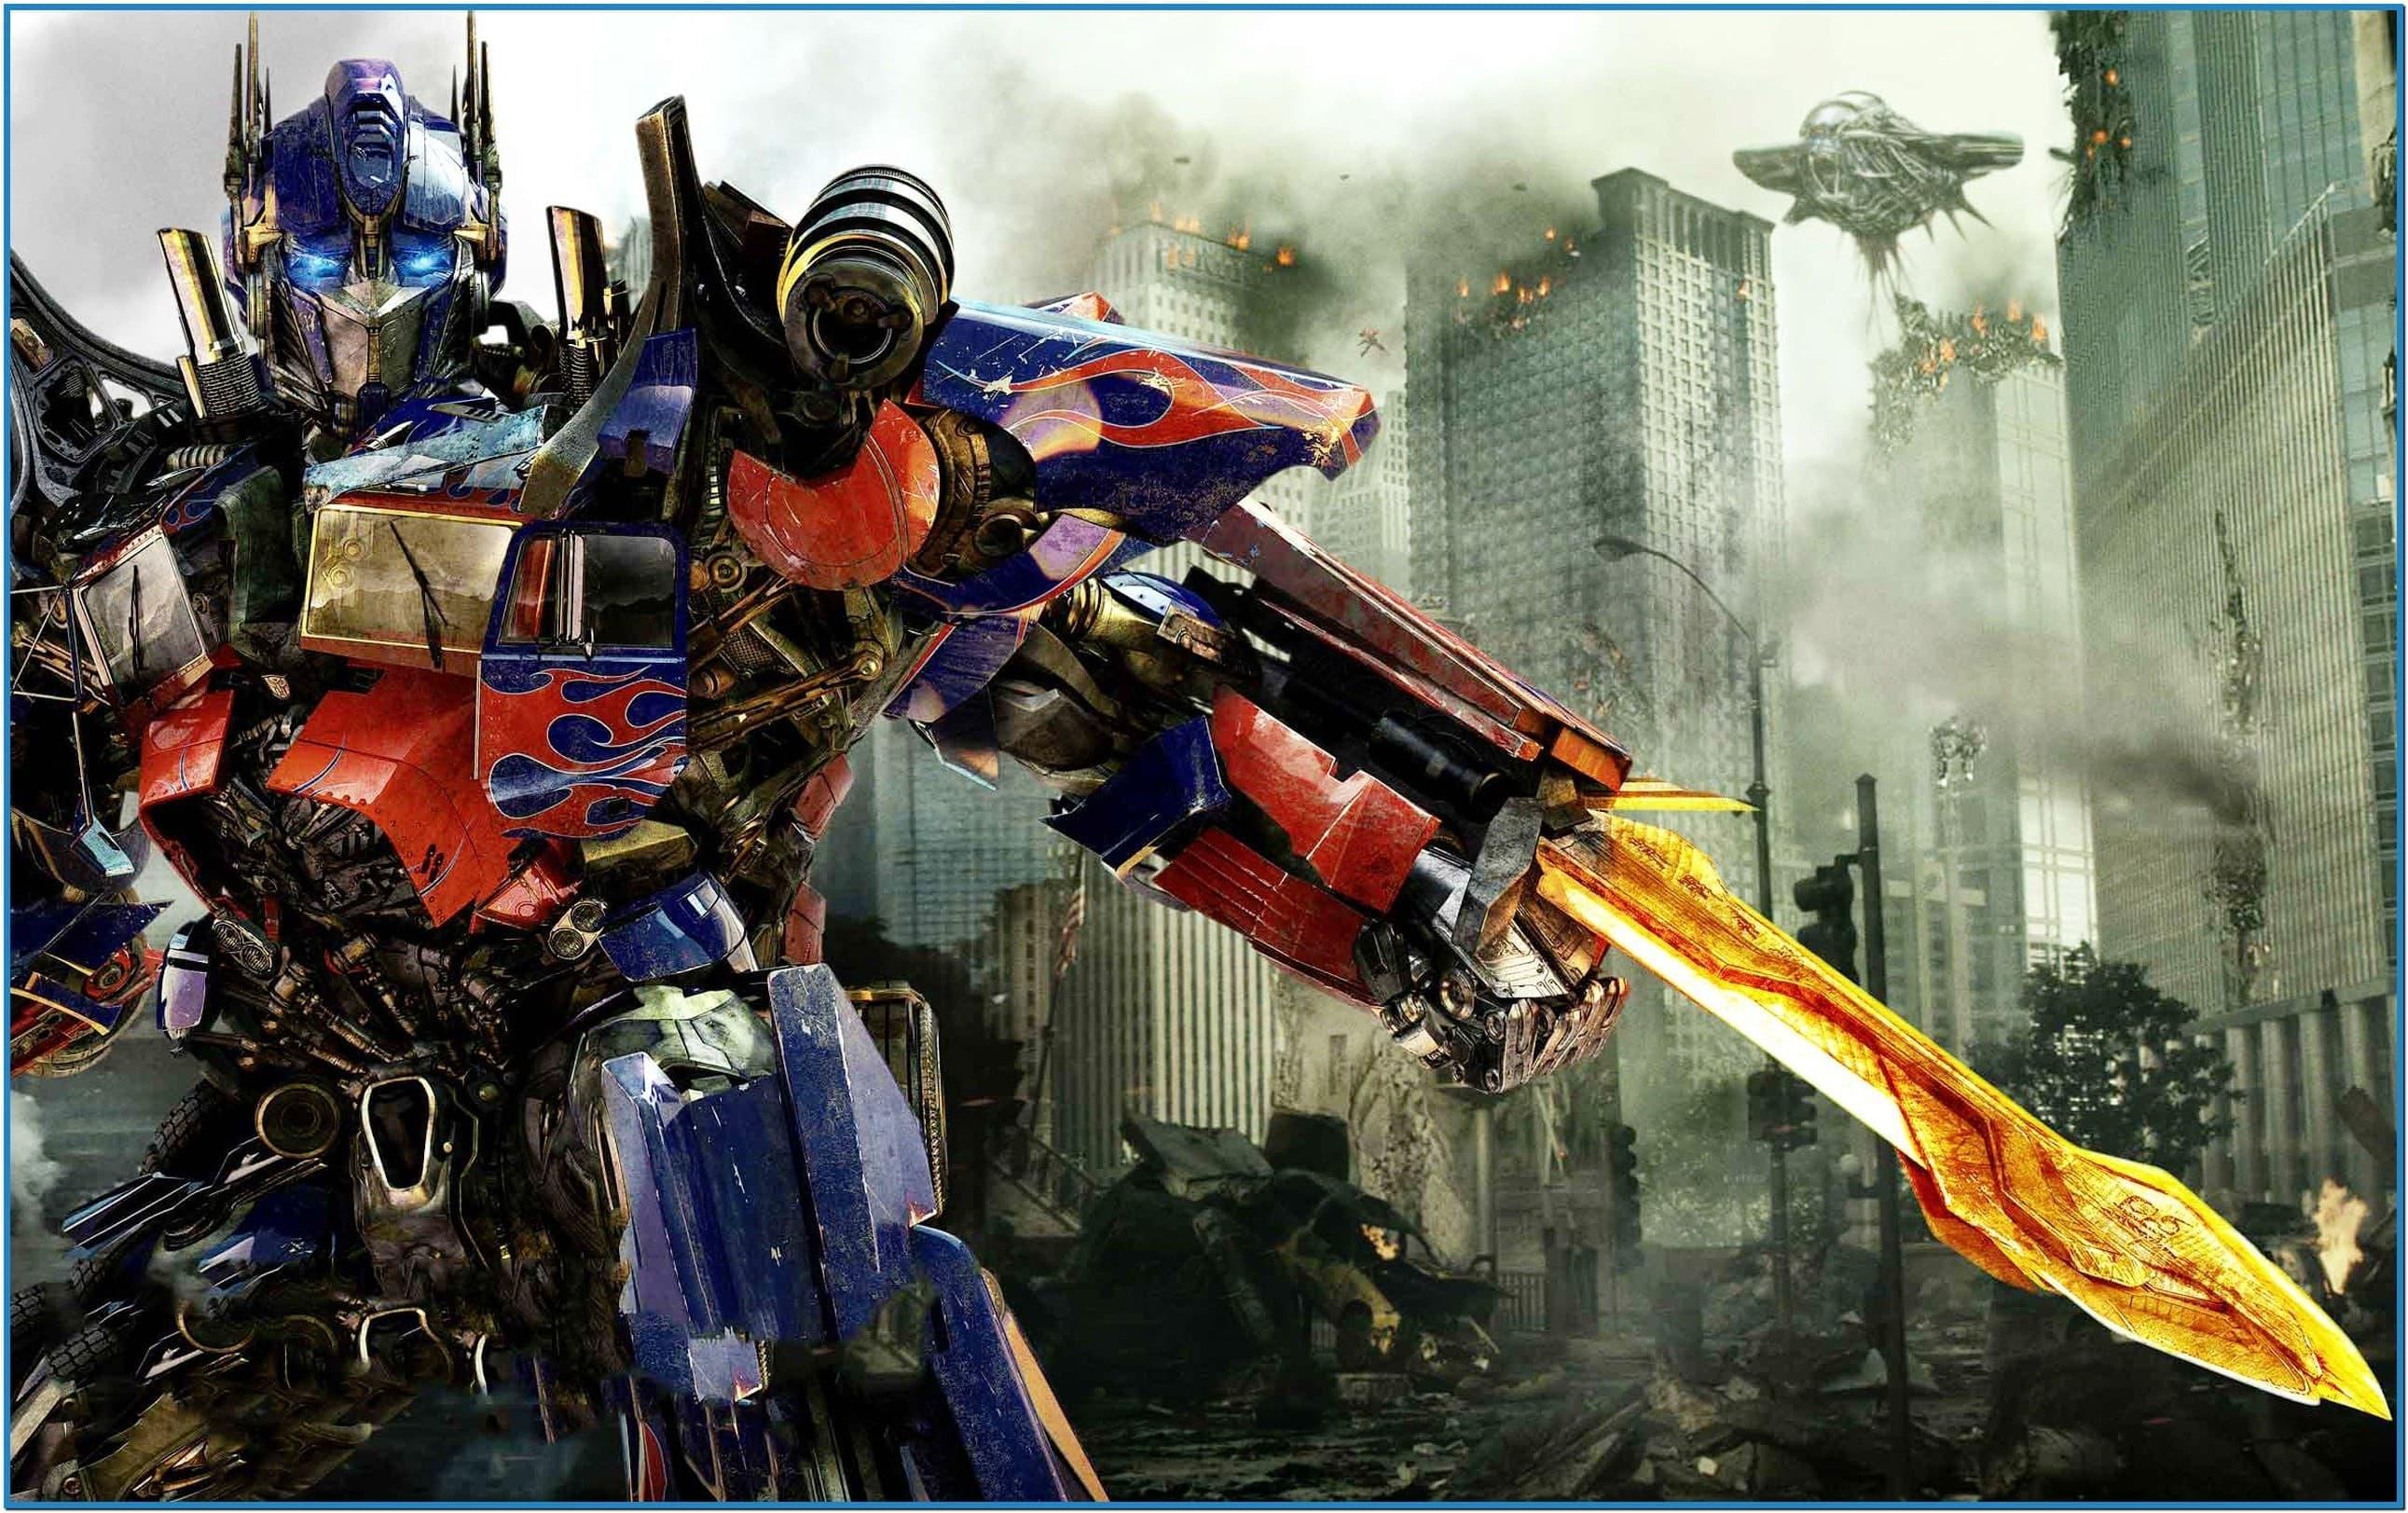 Transformers 3 hd screensaver   Download 2583x1623